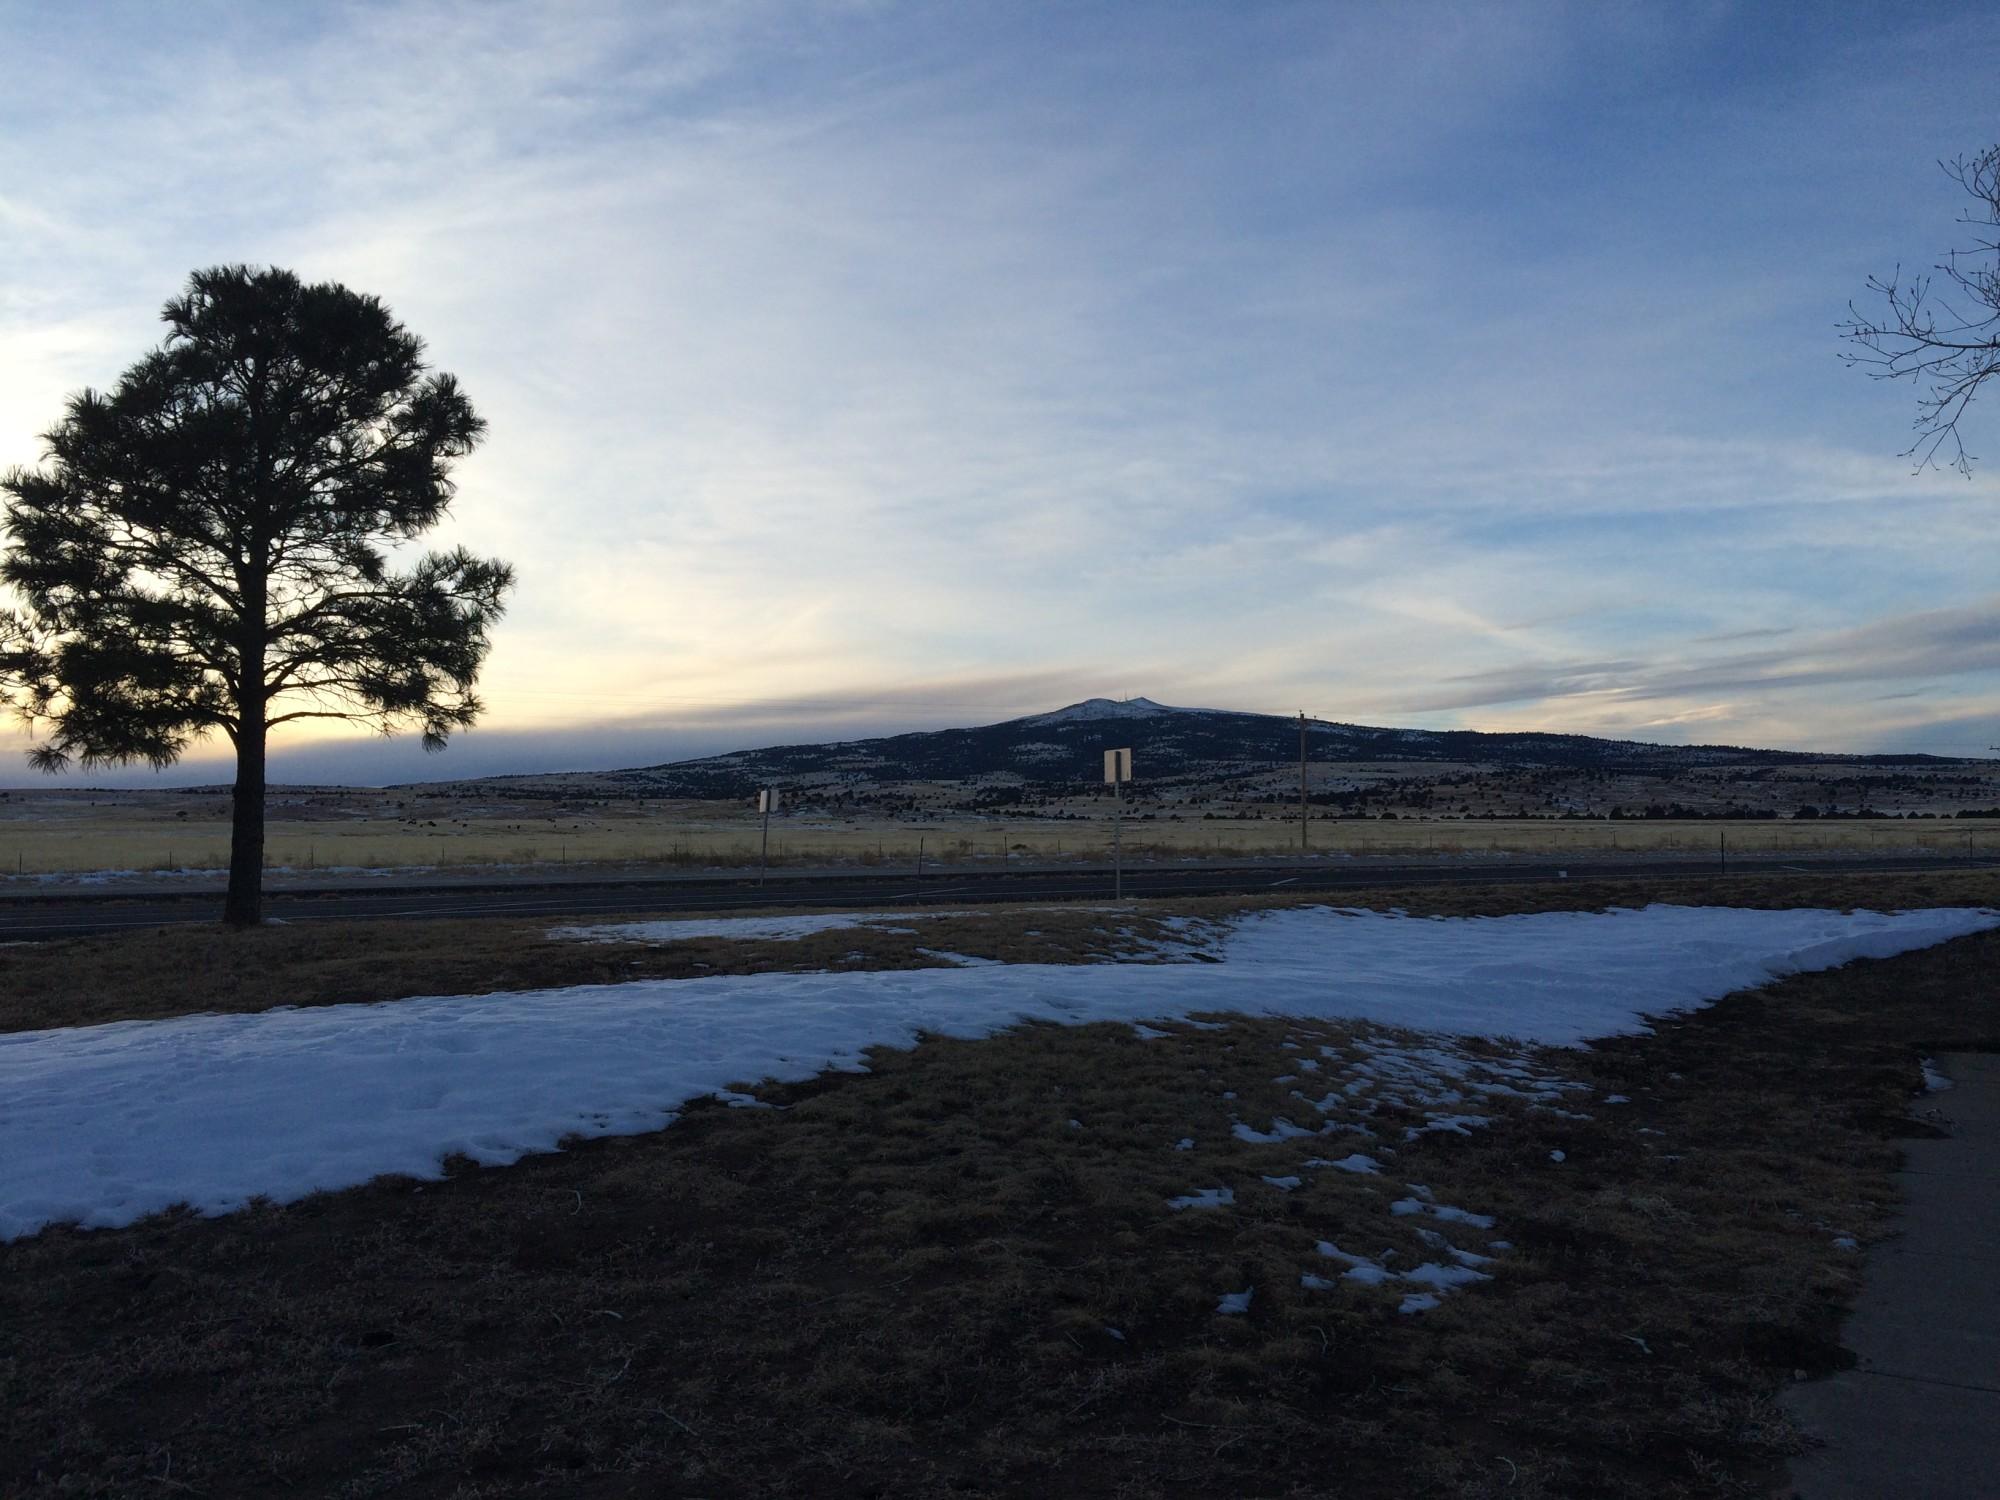 Sierra Grande: An extinct shield volcano